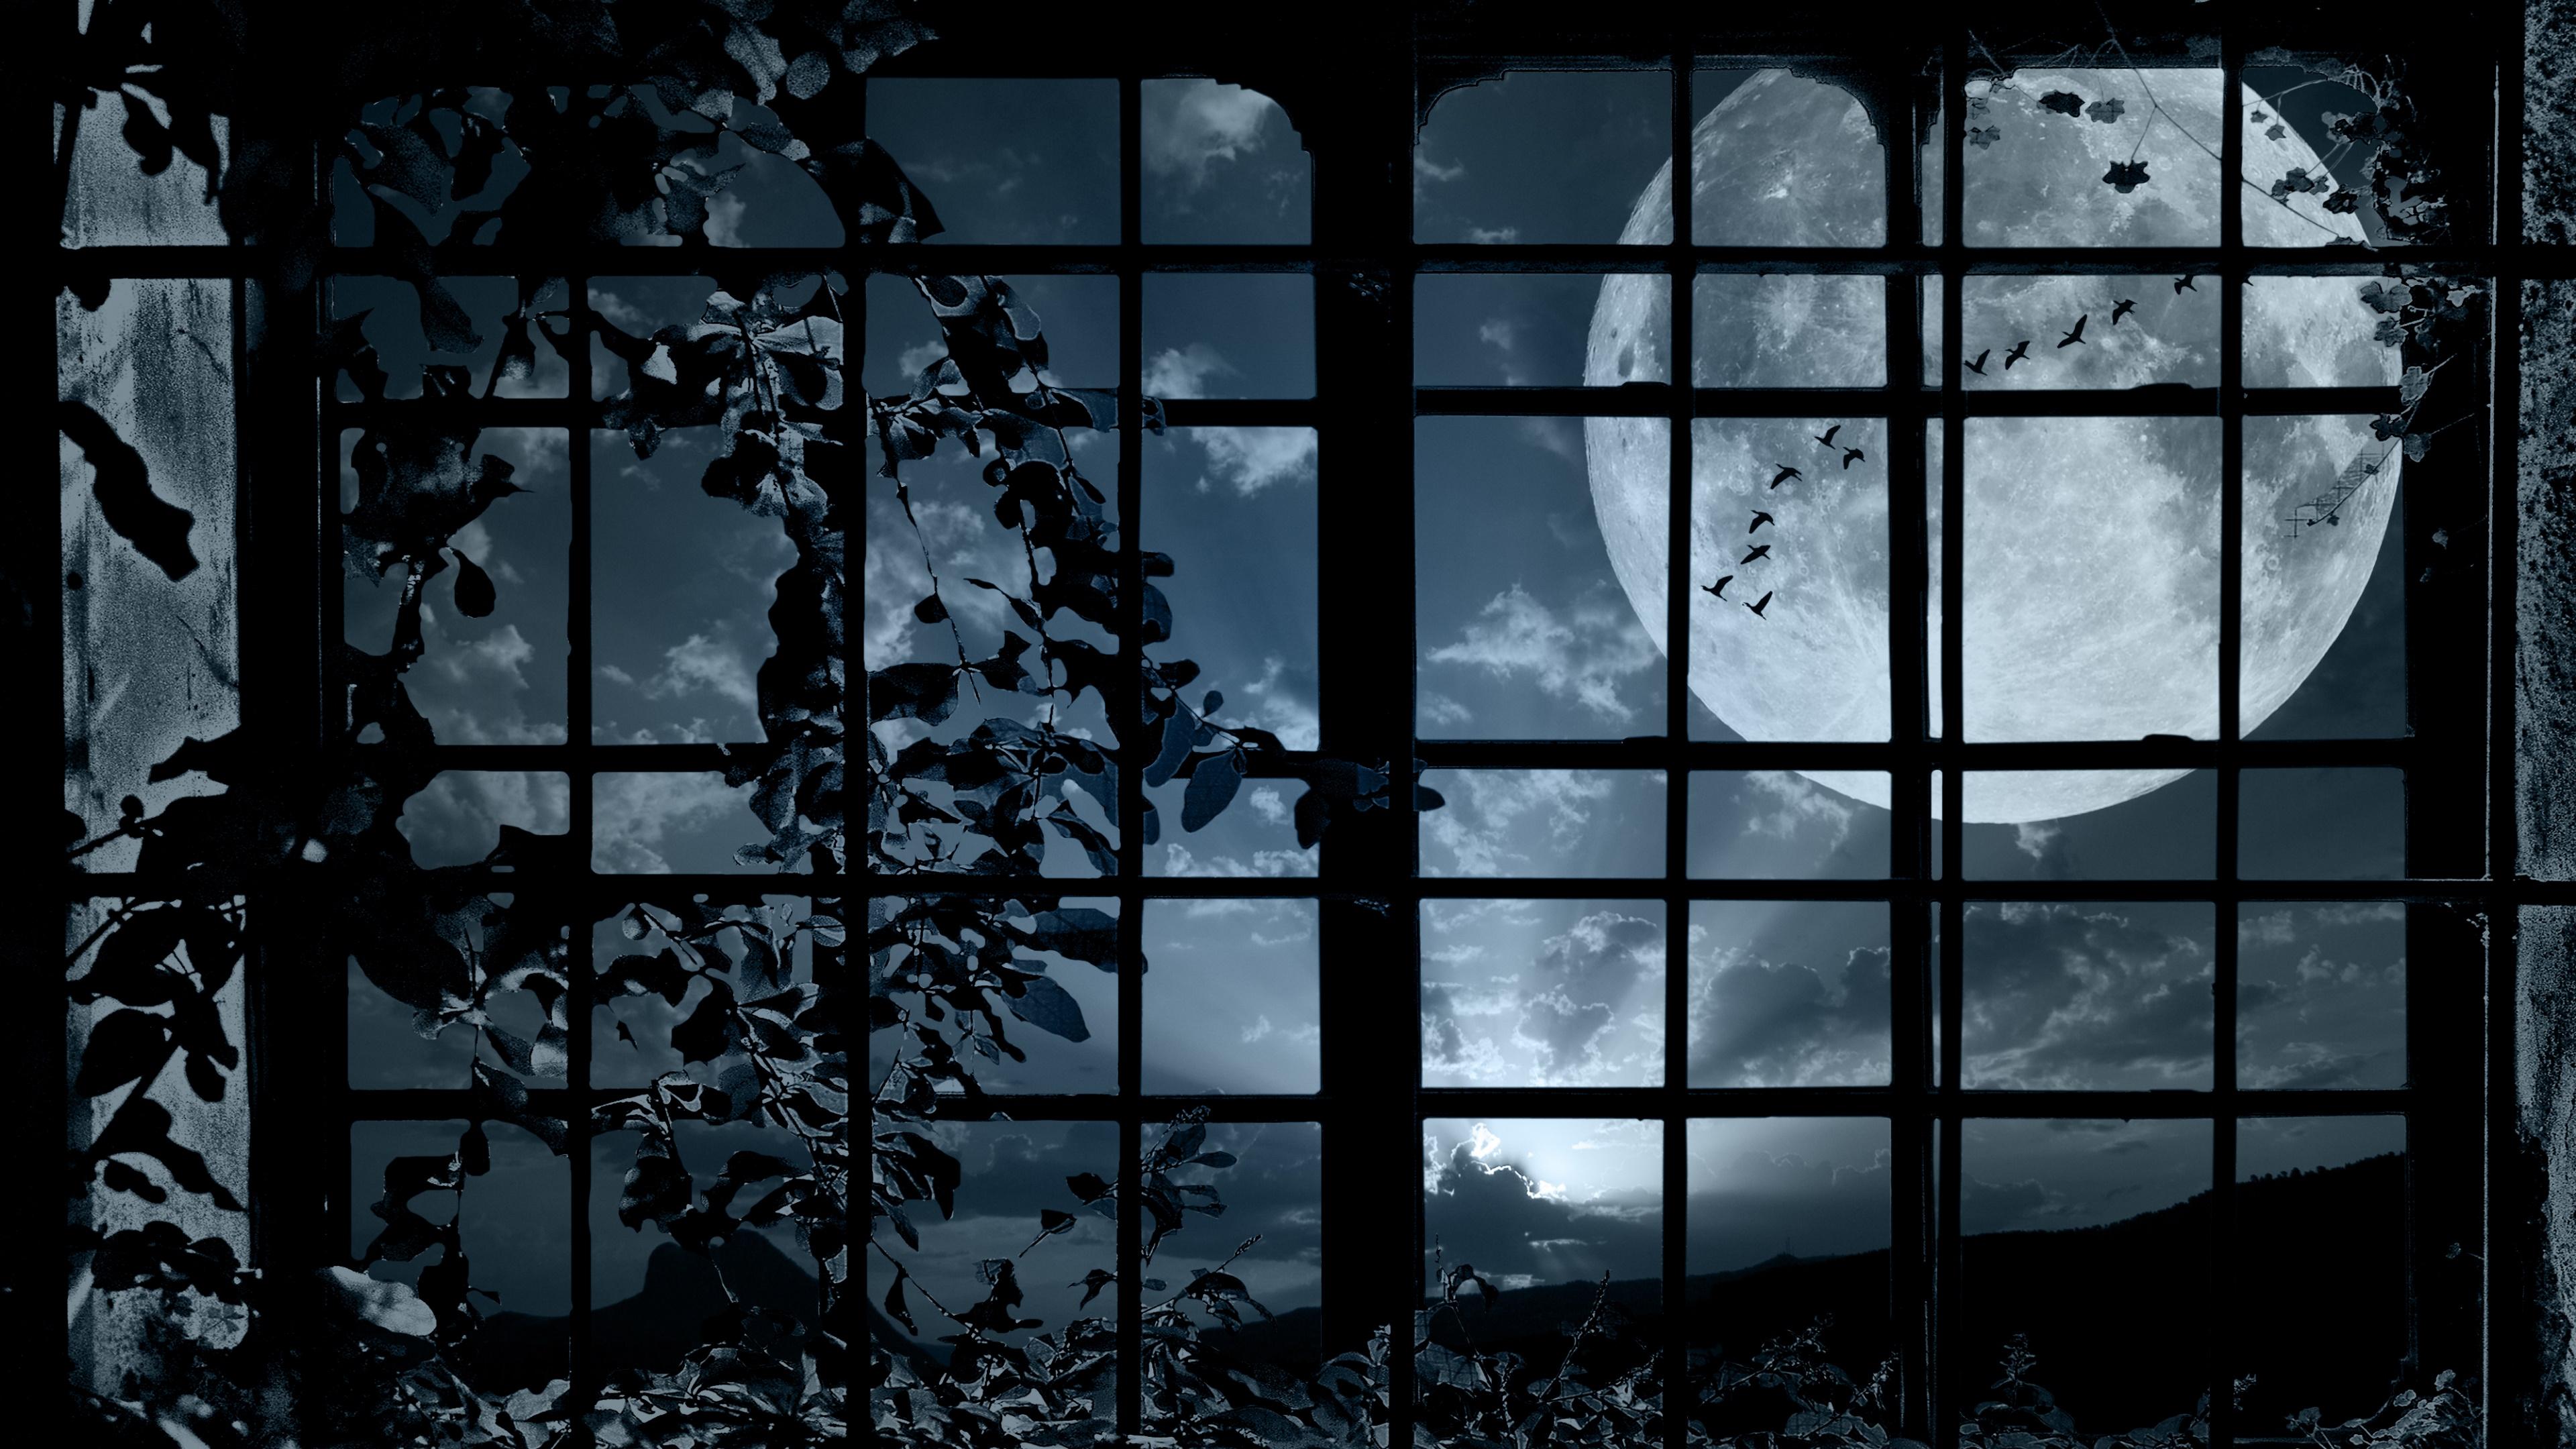 Full moon from a window wallpaper